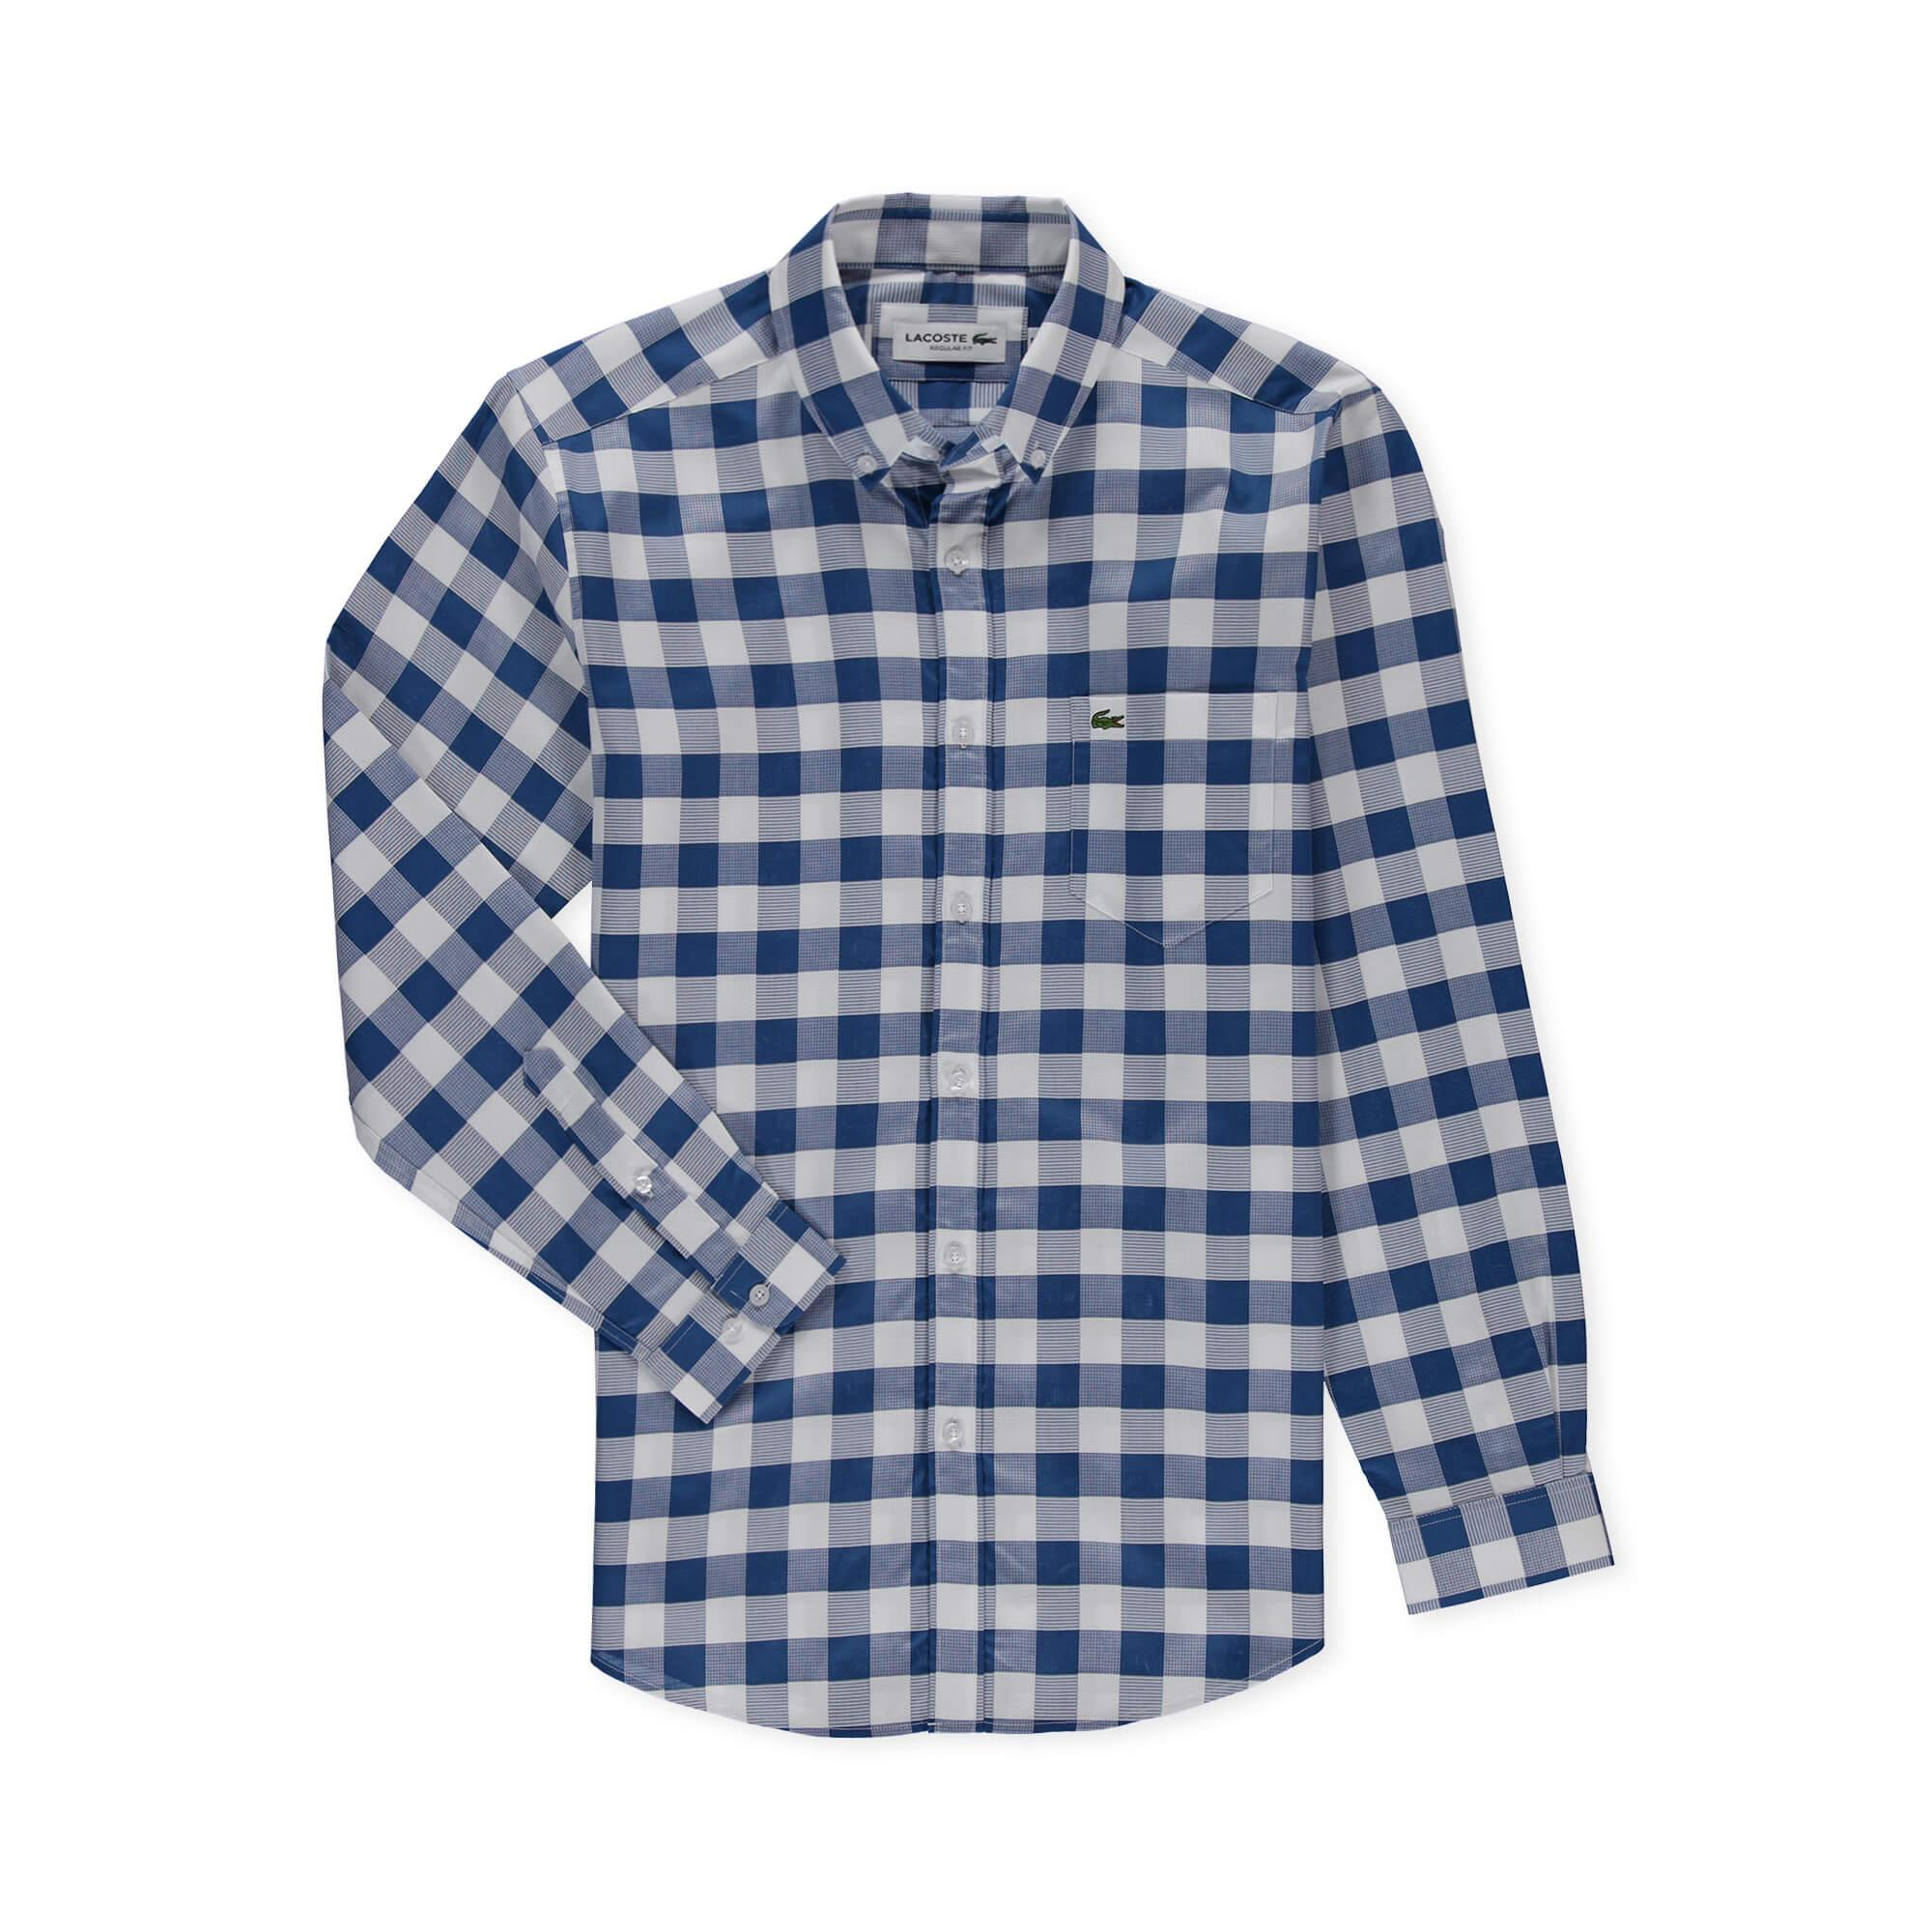 Lacoste Men's Wovens Shirts